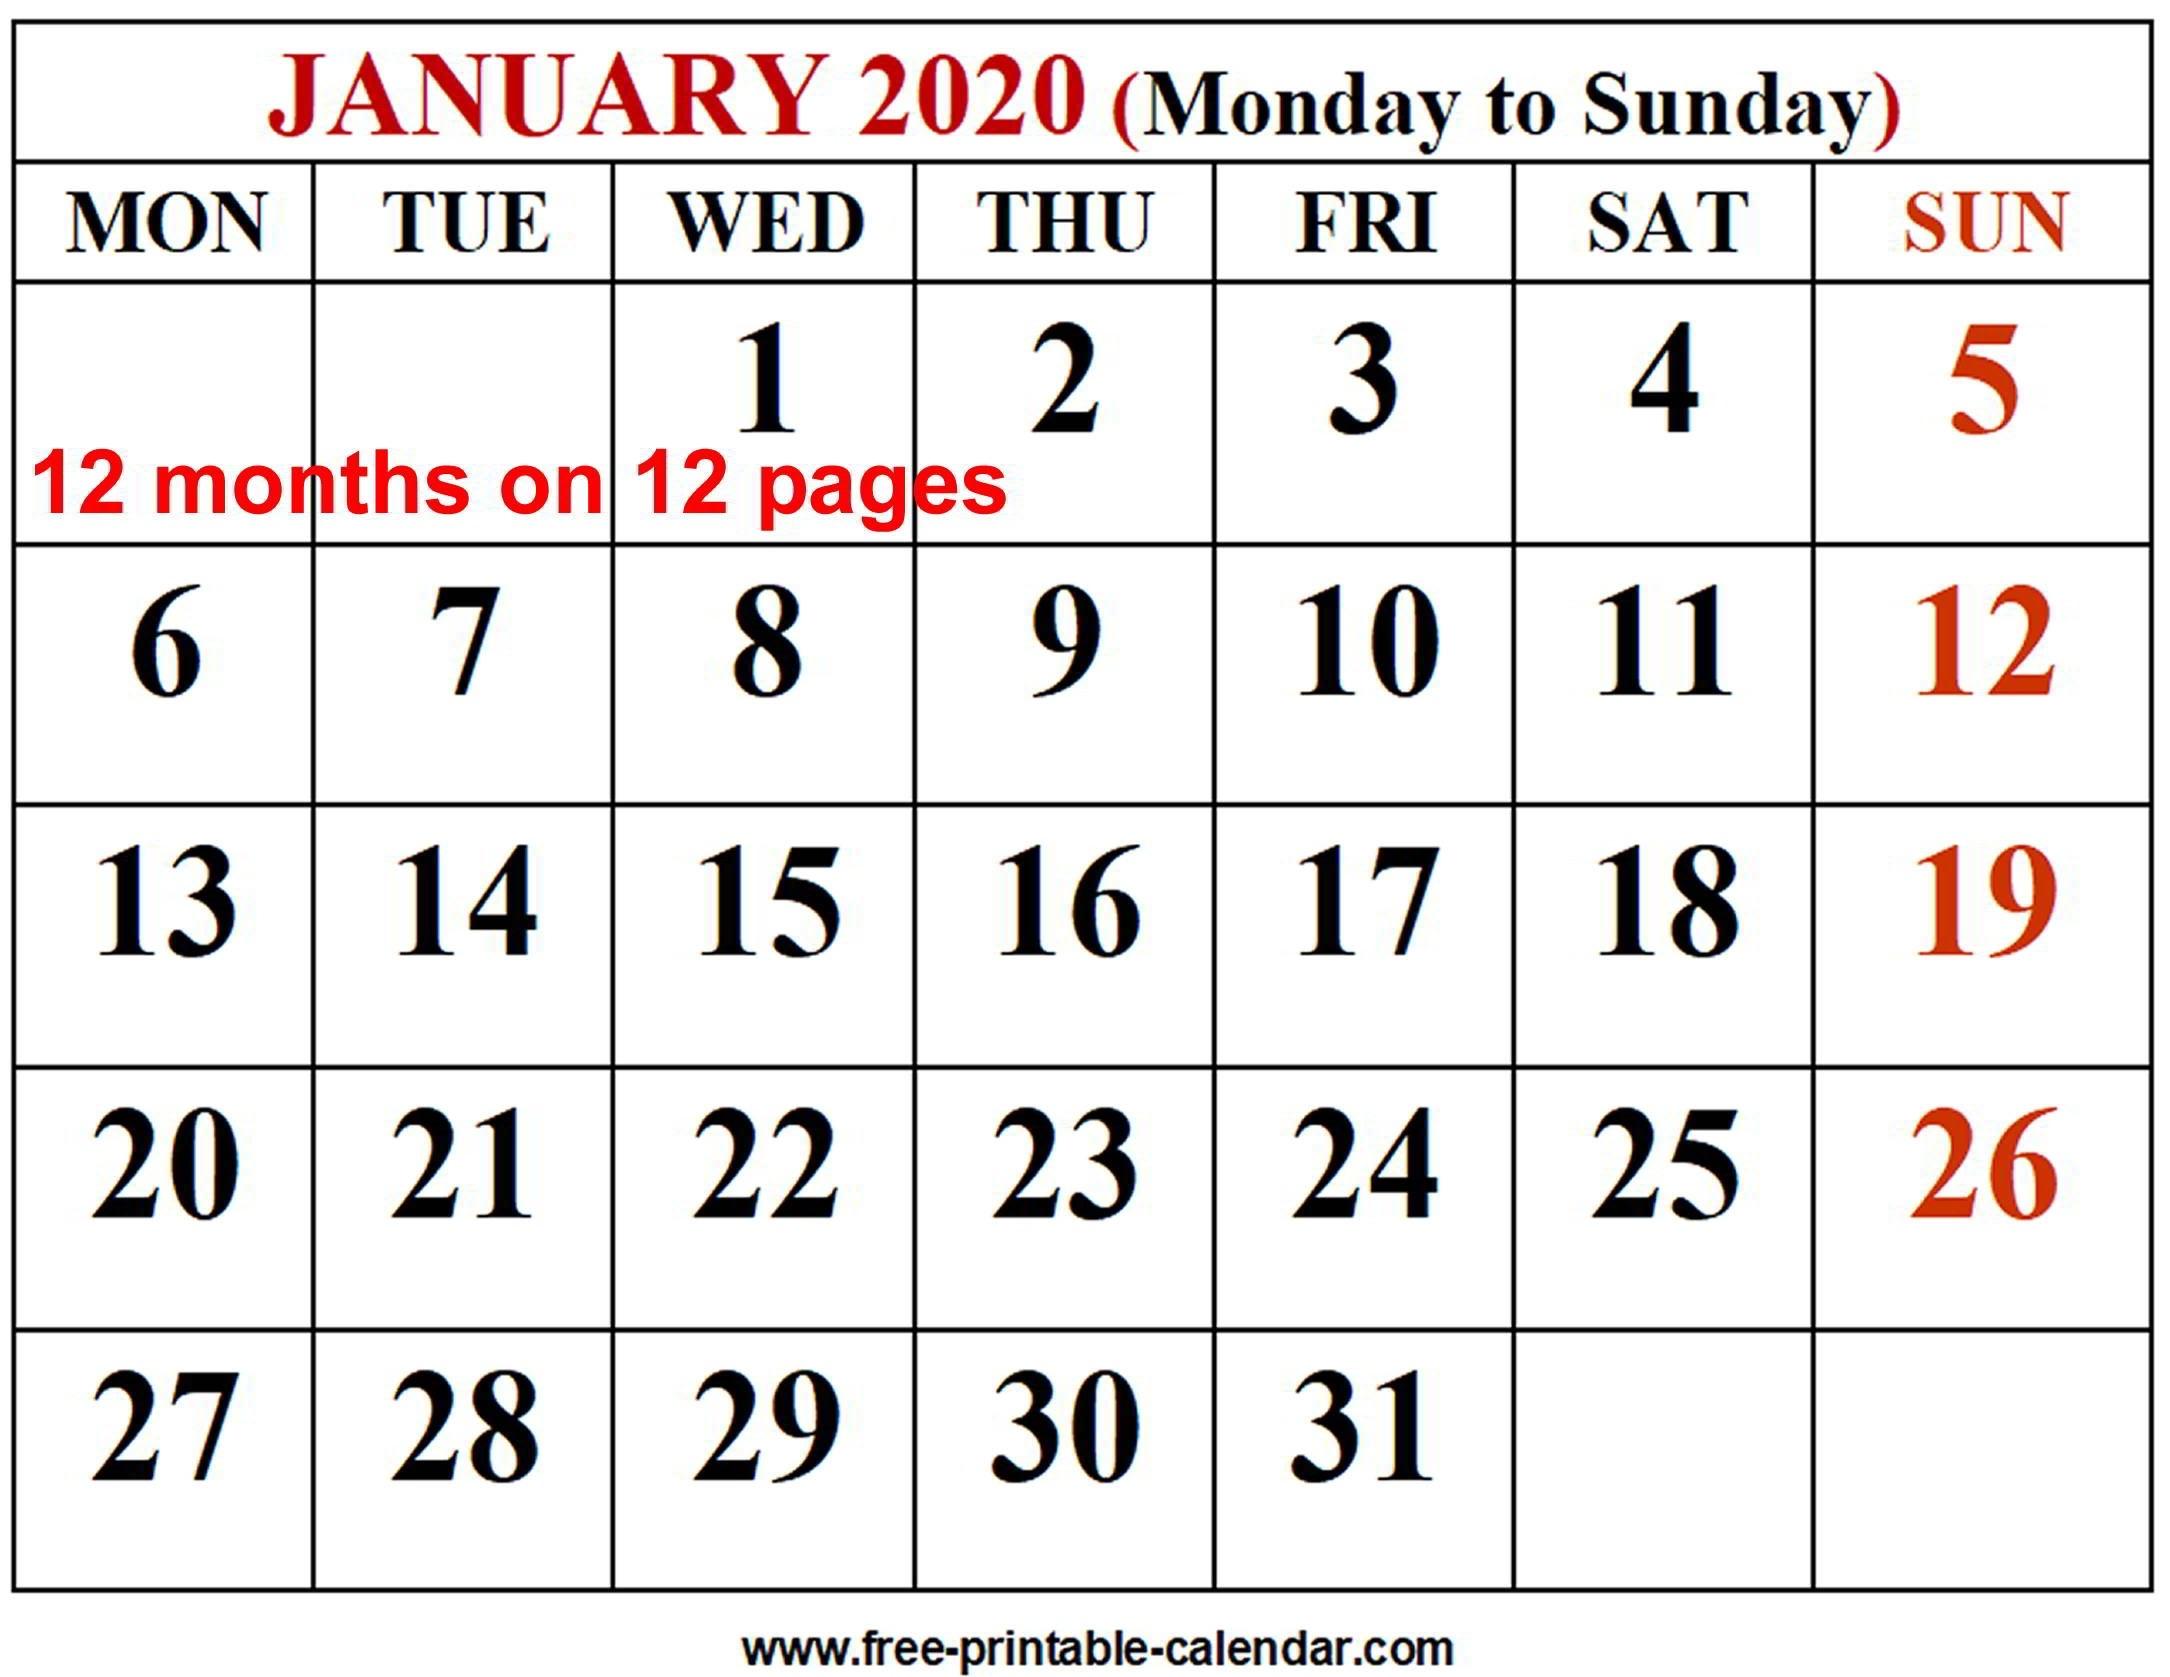 2020 Calendar Template - Free-Printable-Calendar-2 Page Calendar Printable Template 2020